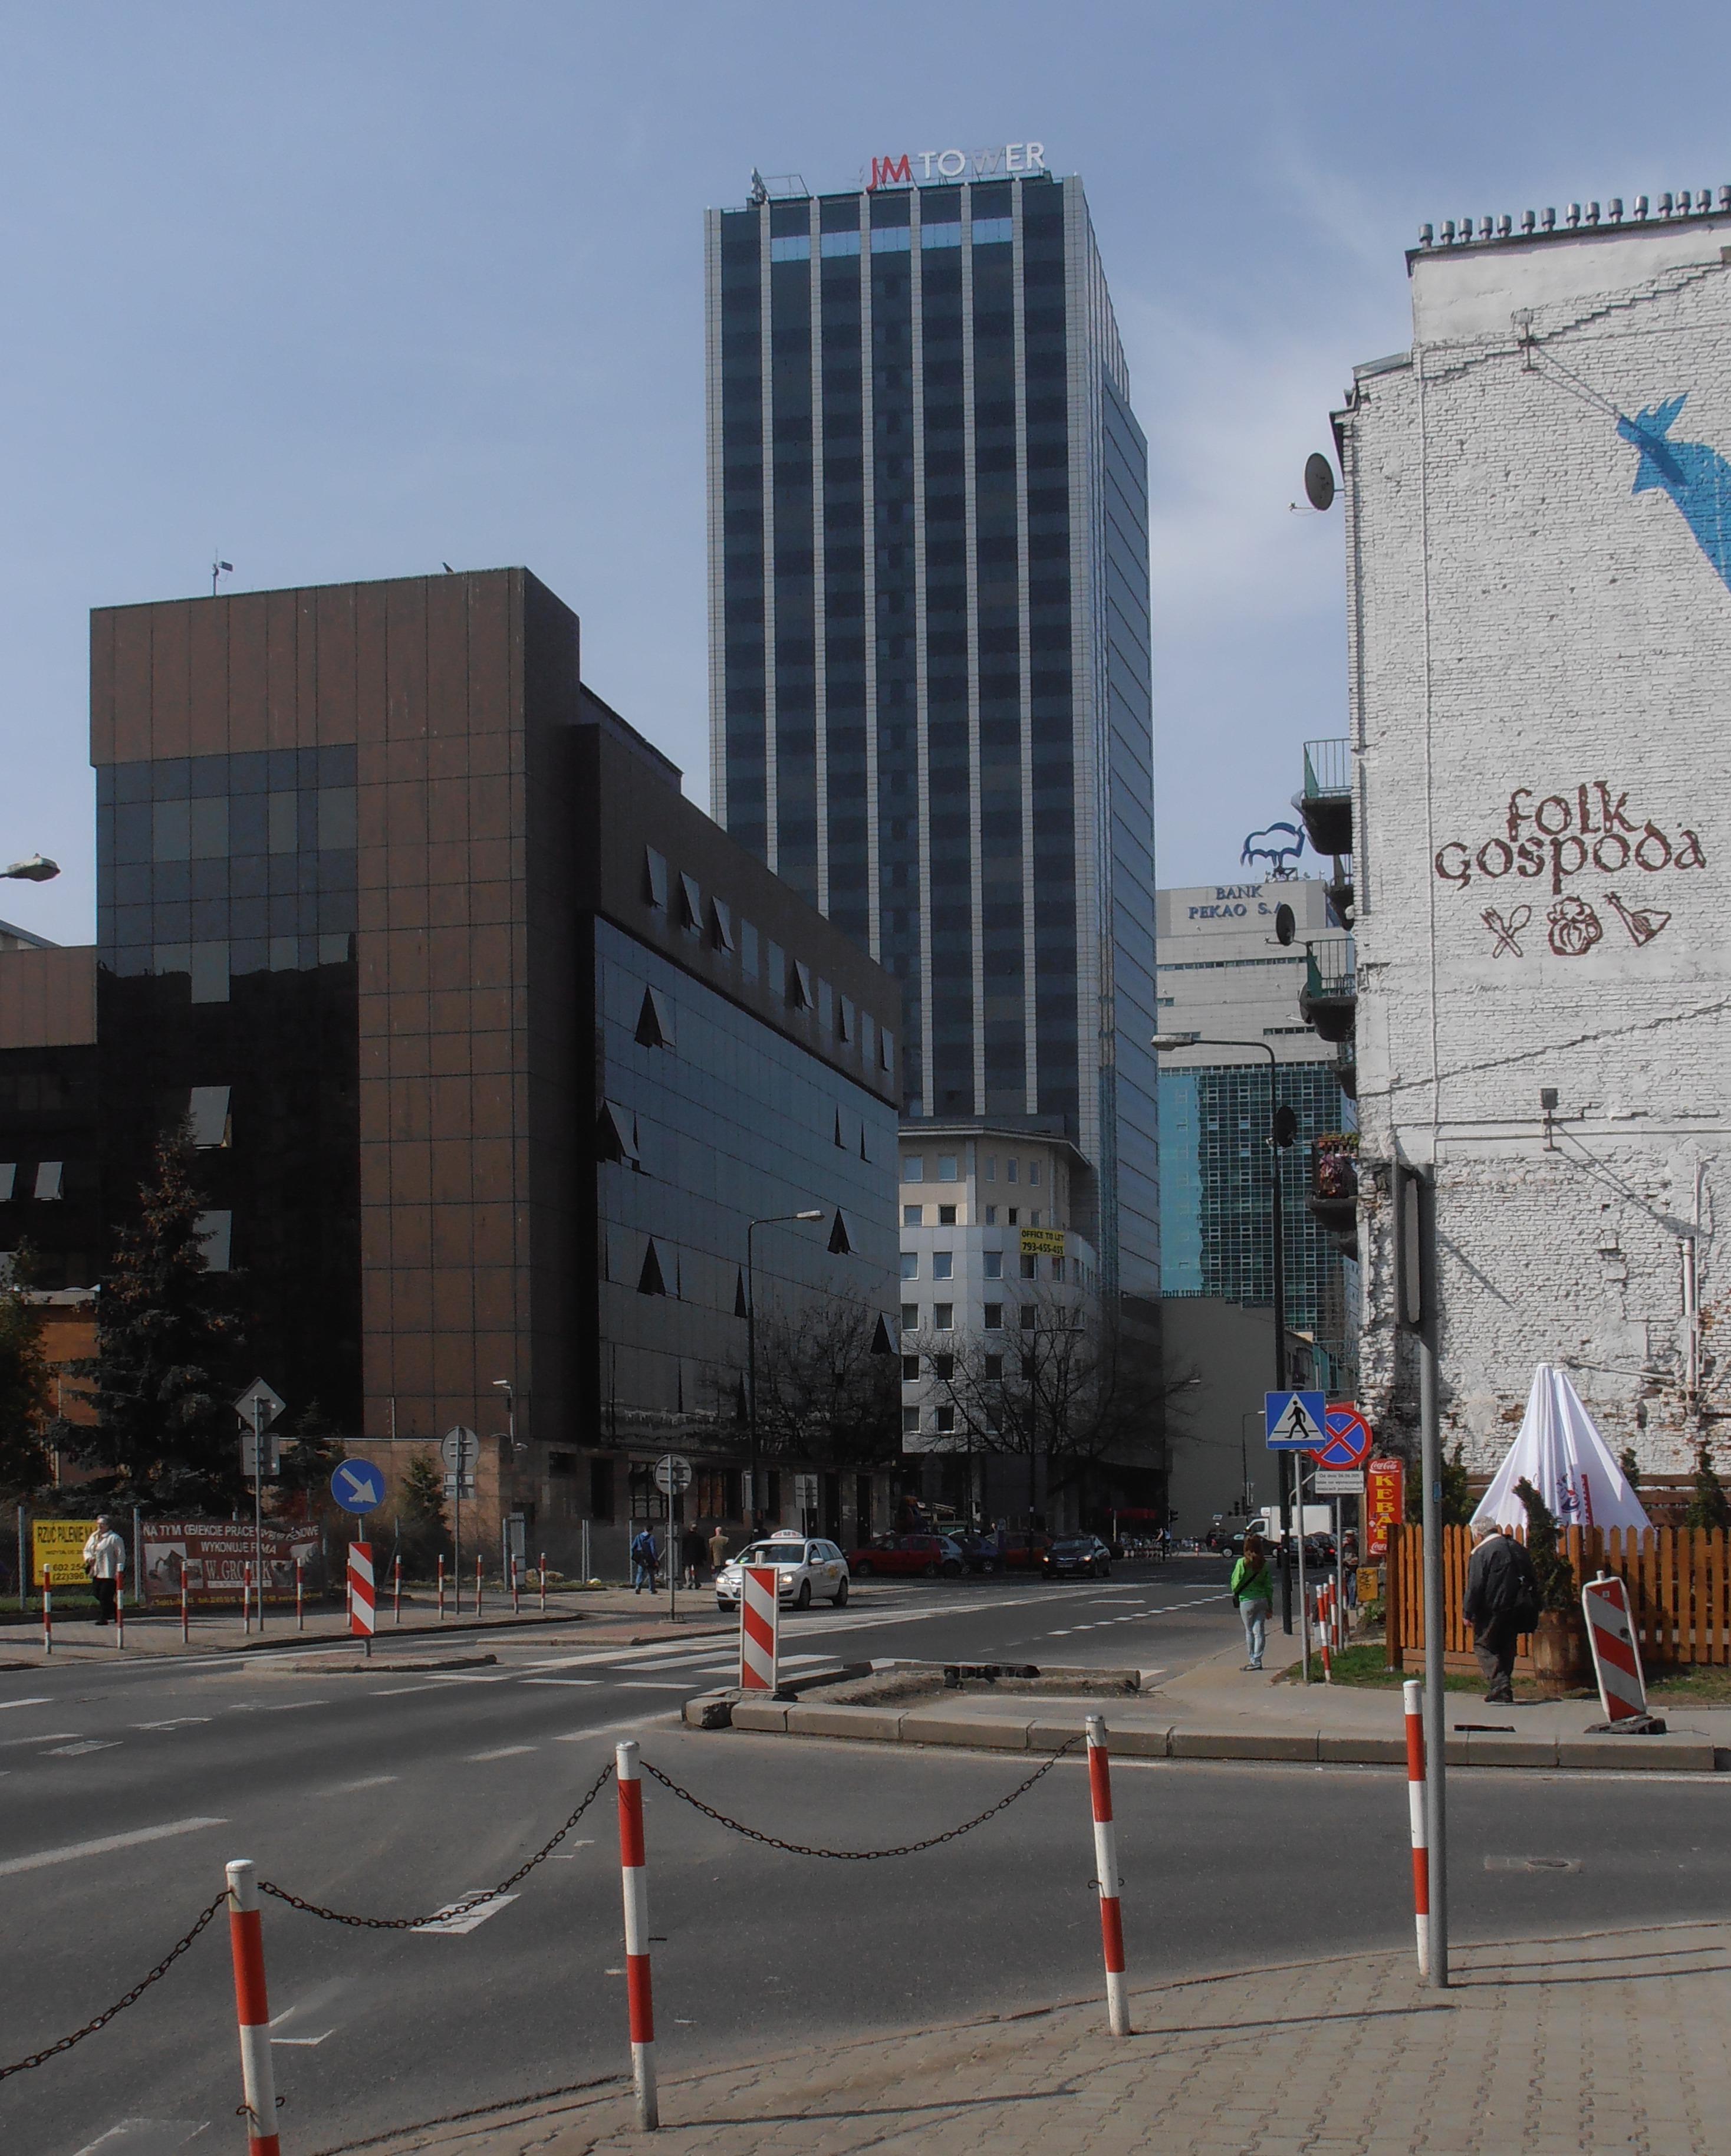 Ulica Grzybowska